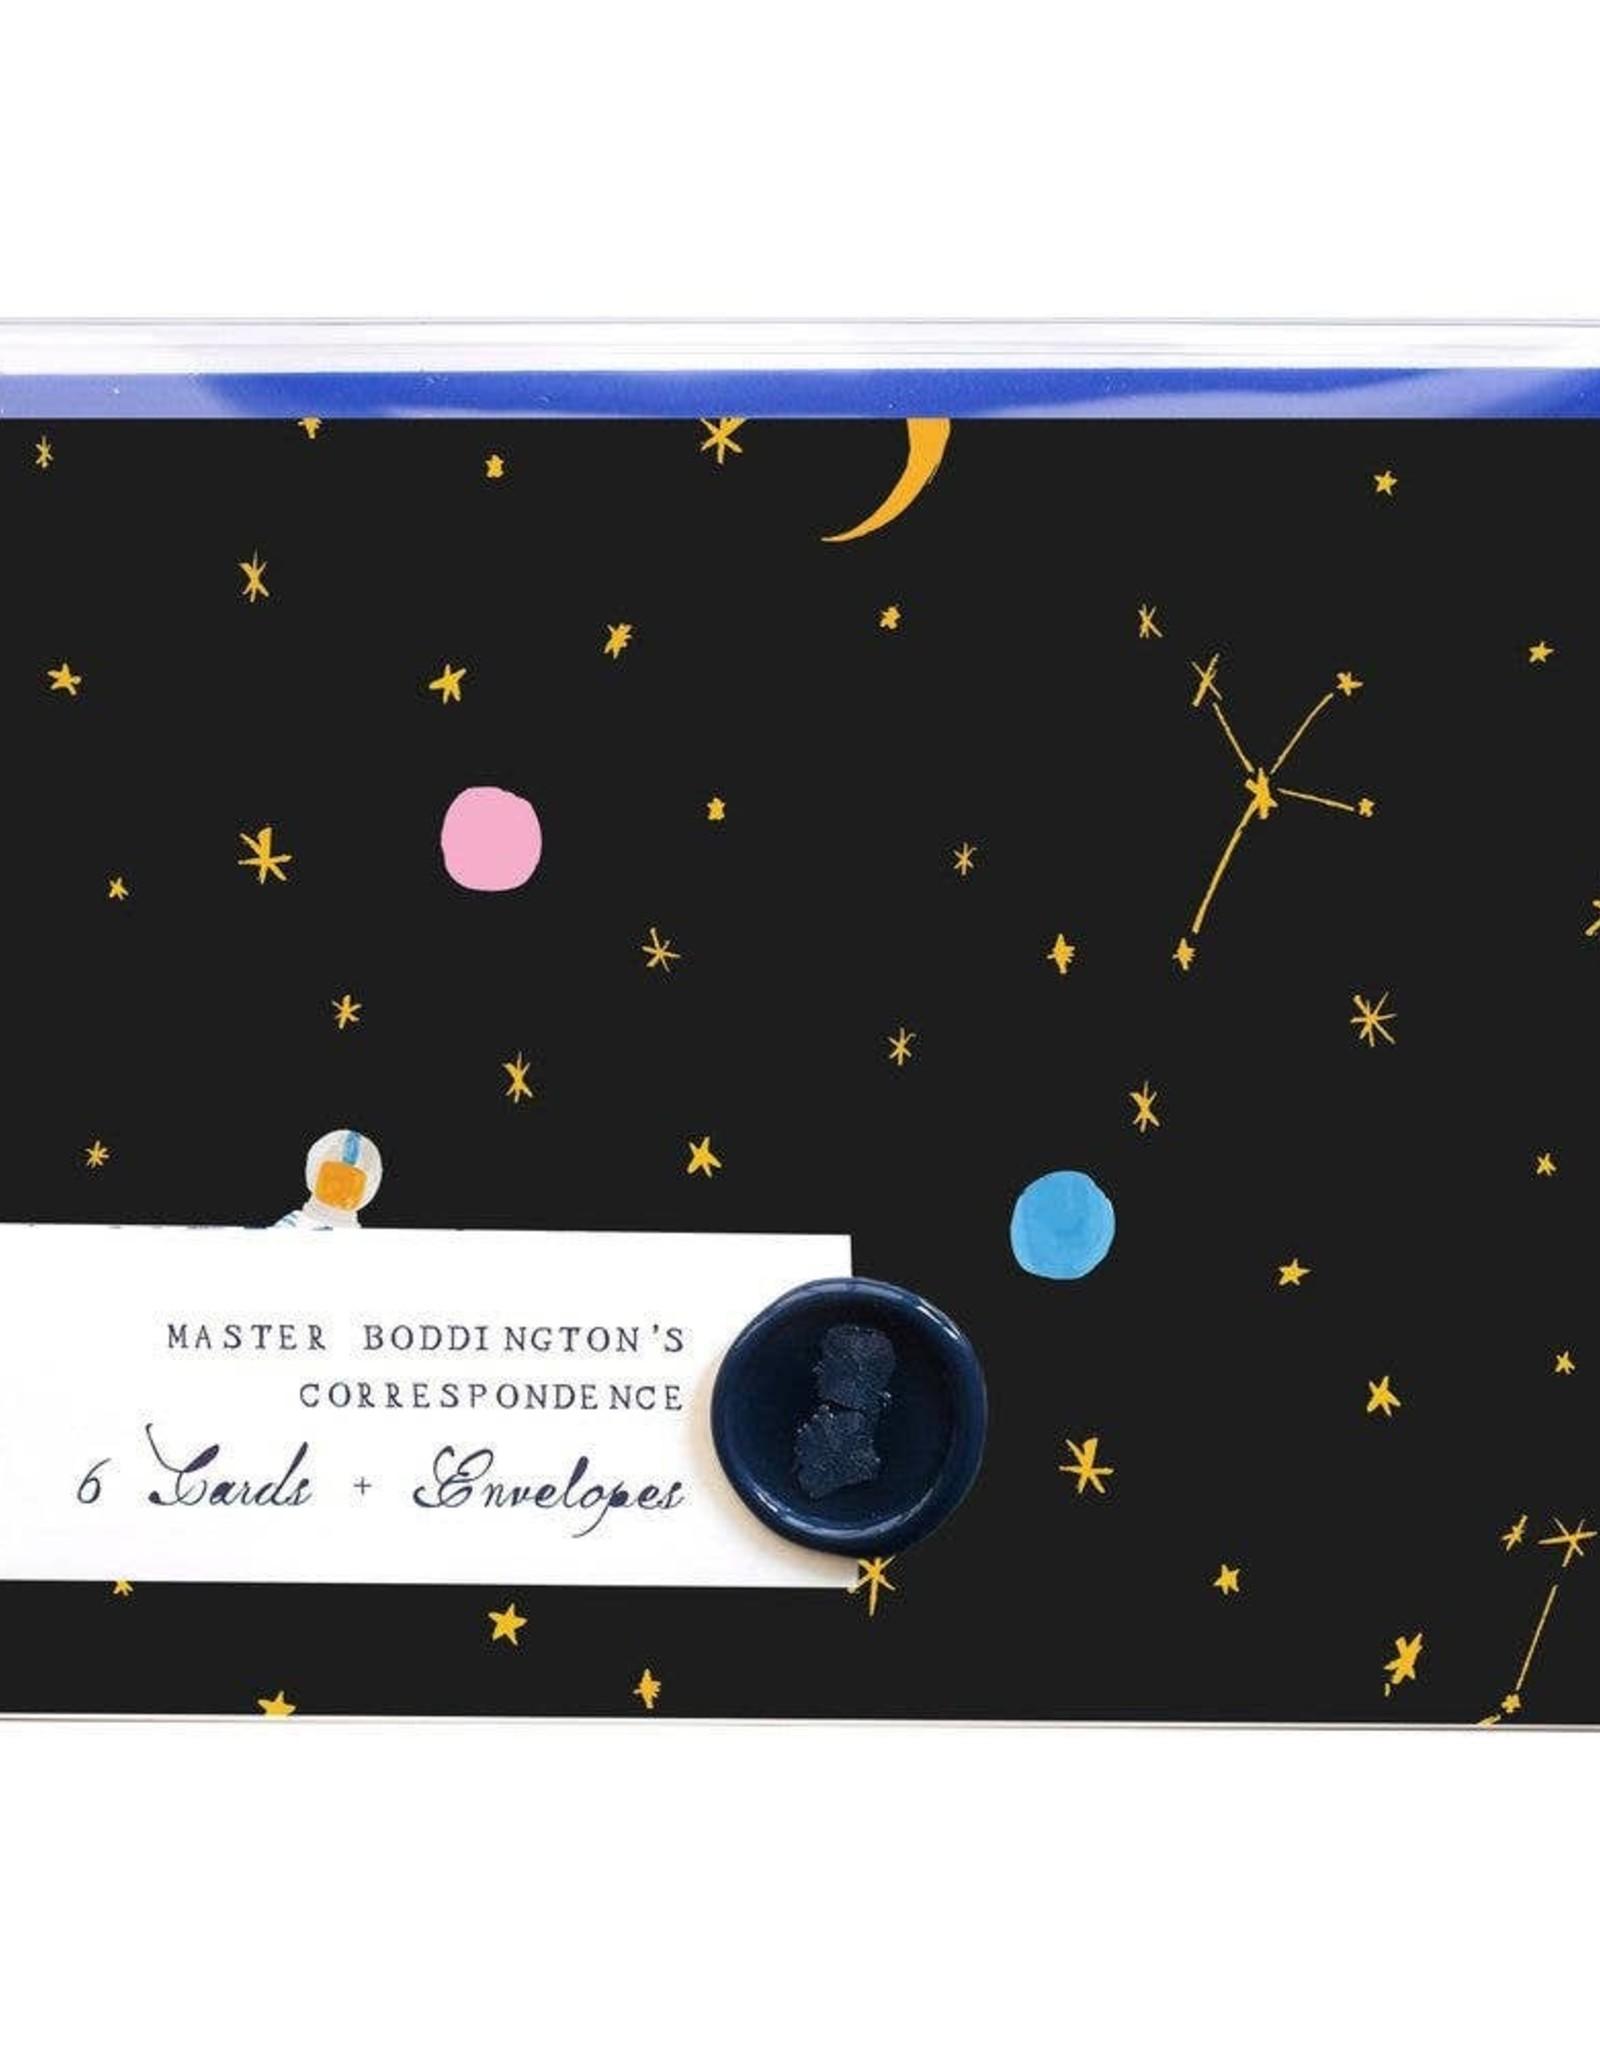 Mr. Boddington's Mr. Boddington's | Where is Jupiter Box of 6 Notecards